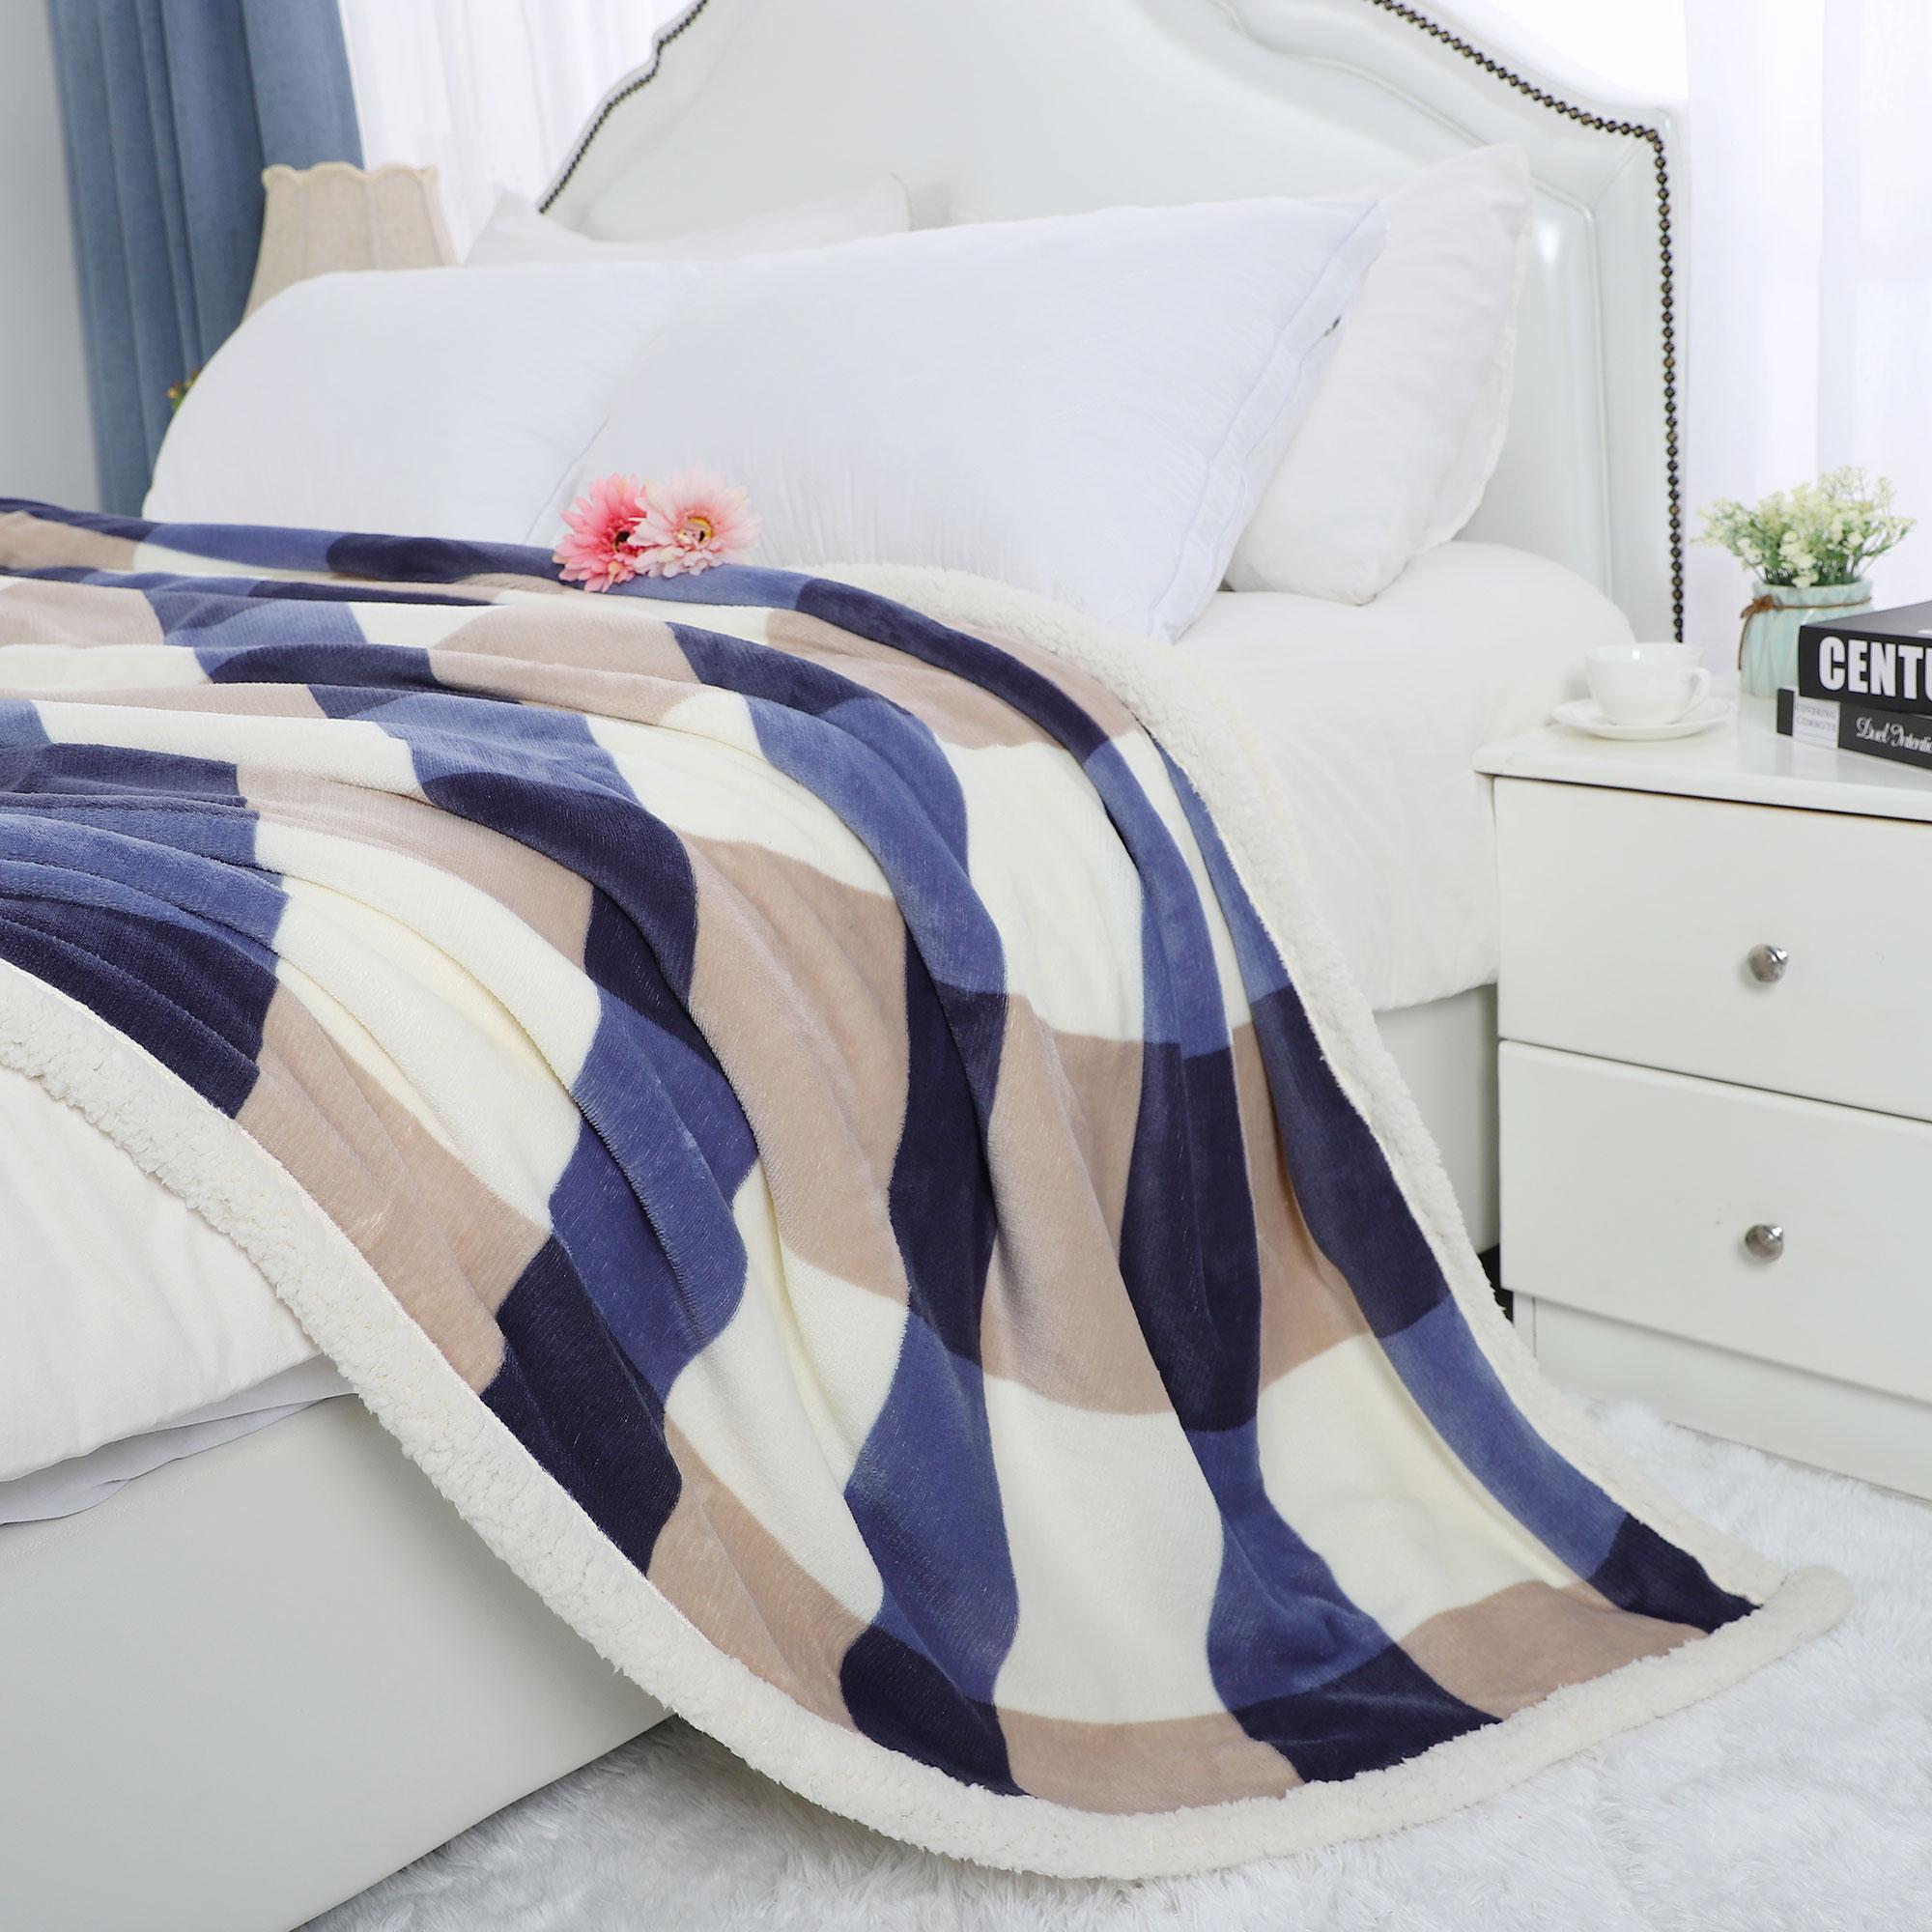 "Soft Faux Lambswool Blanket Reversible Plaid Pattern Bed Blanket Full 70"" x 78"" - image 5 de 8"